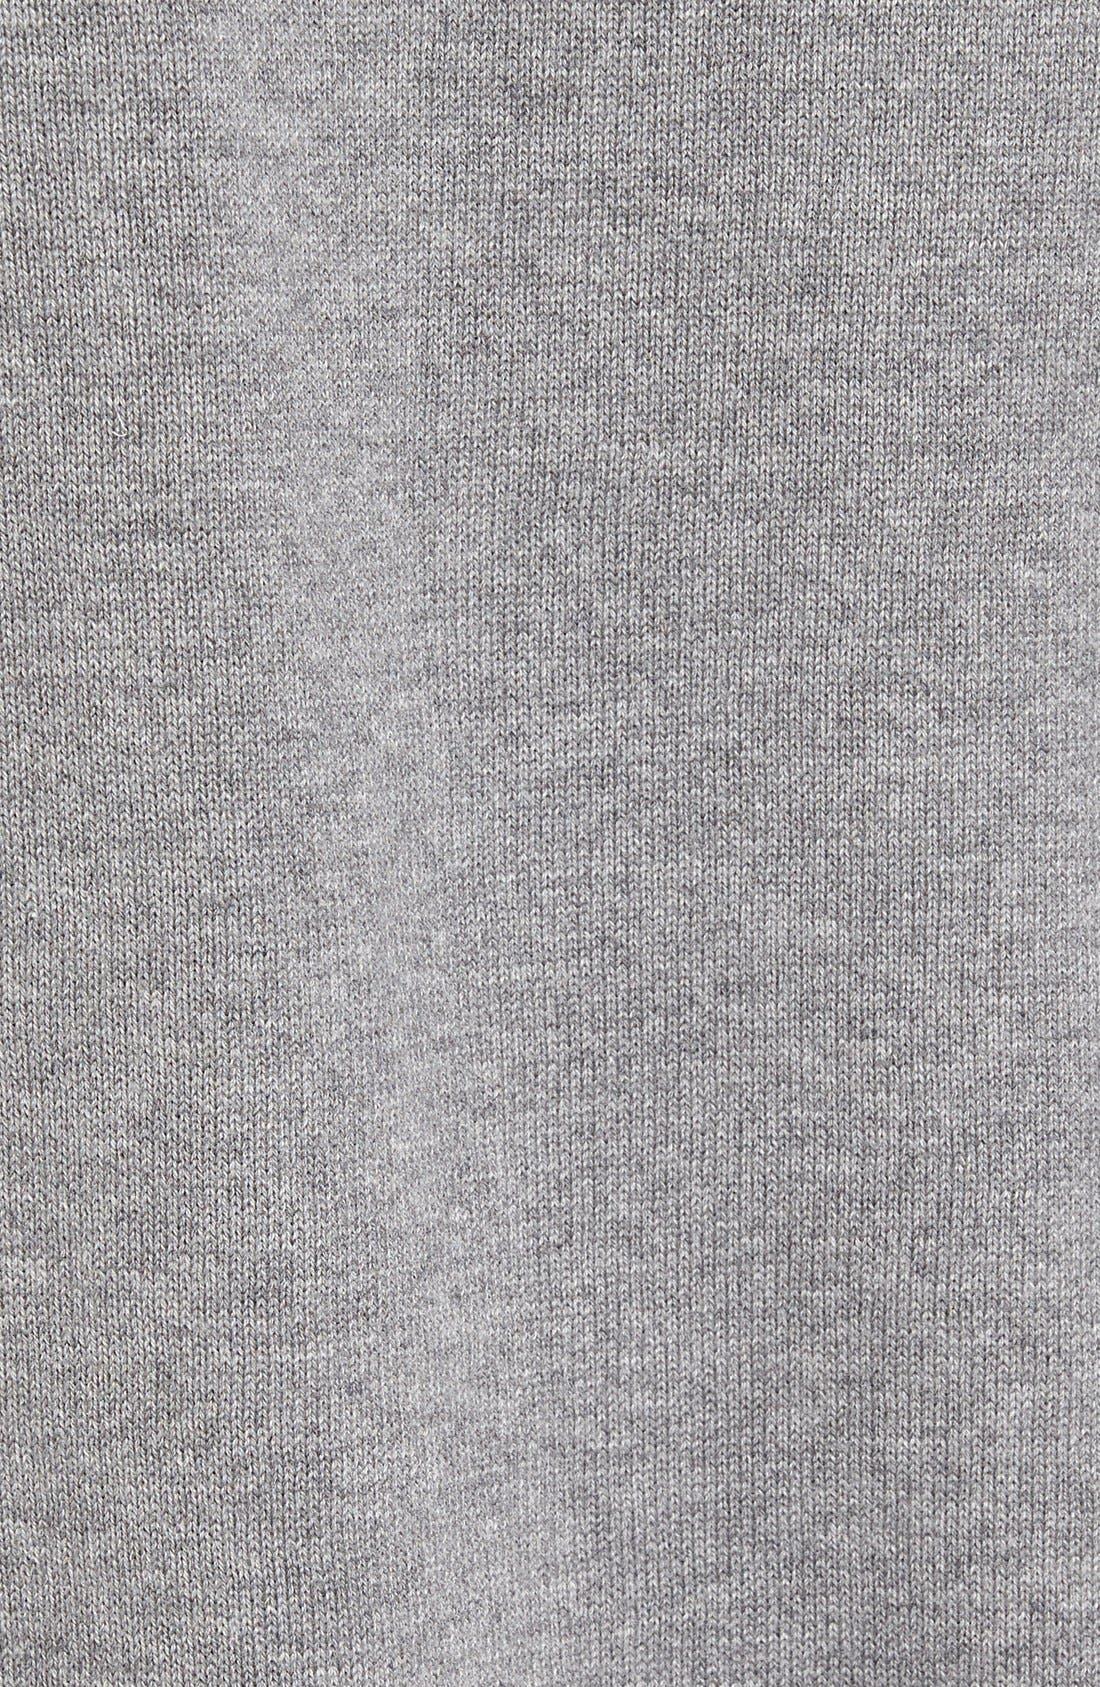 Nylon Trim Pullover,                             Alternate thumbnail 14, color,